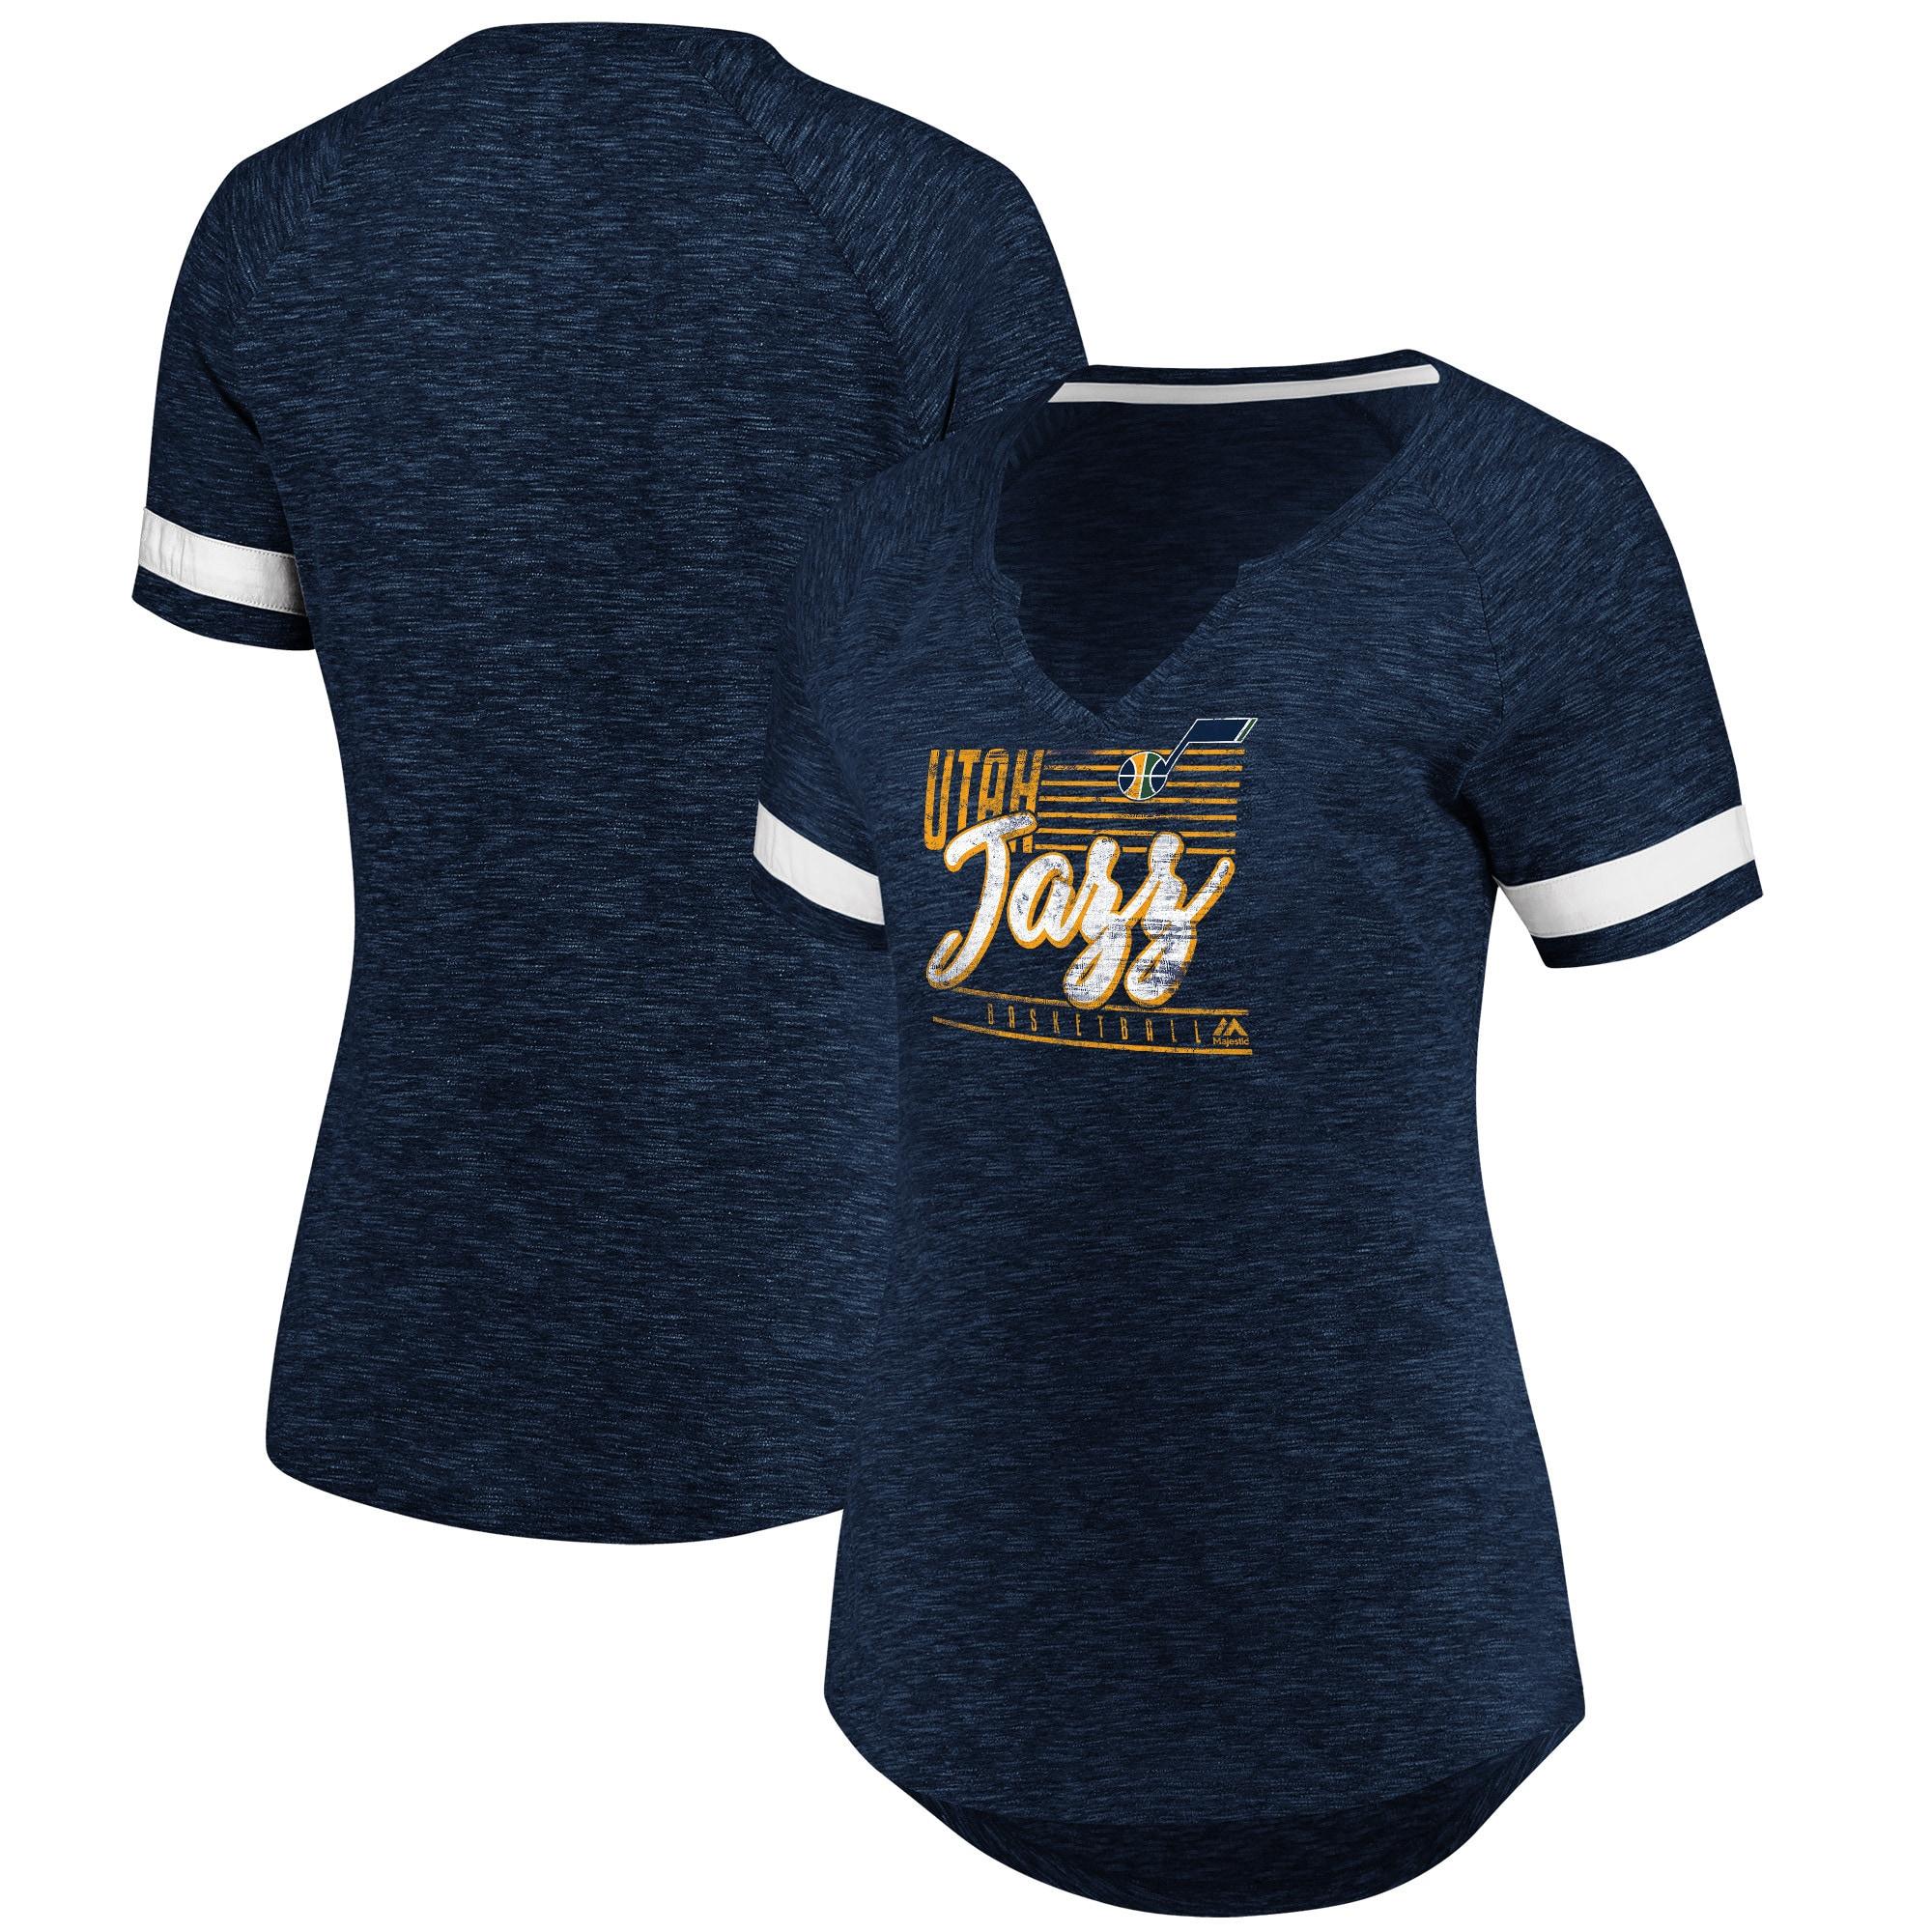 Utah Jazz Fanatics Branded Women's Showtime Winning With Pride Notch Neck T-Shirt - Navy/White